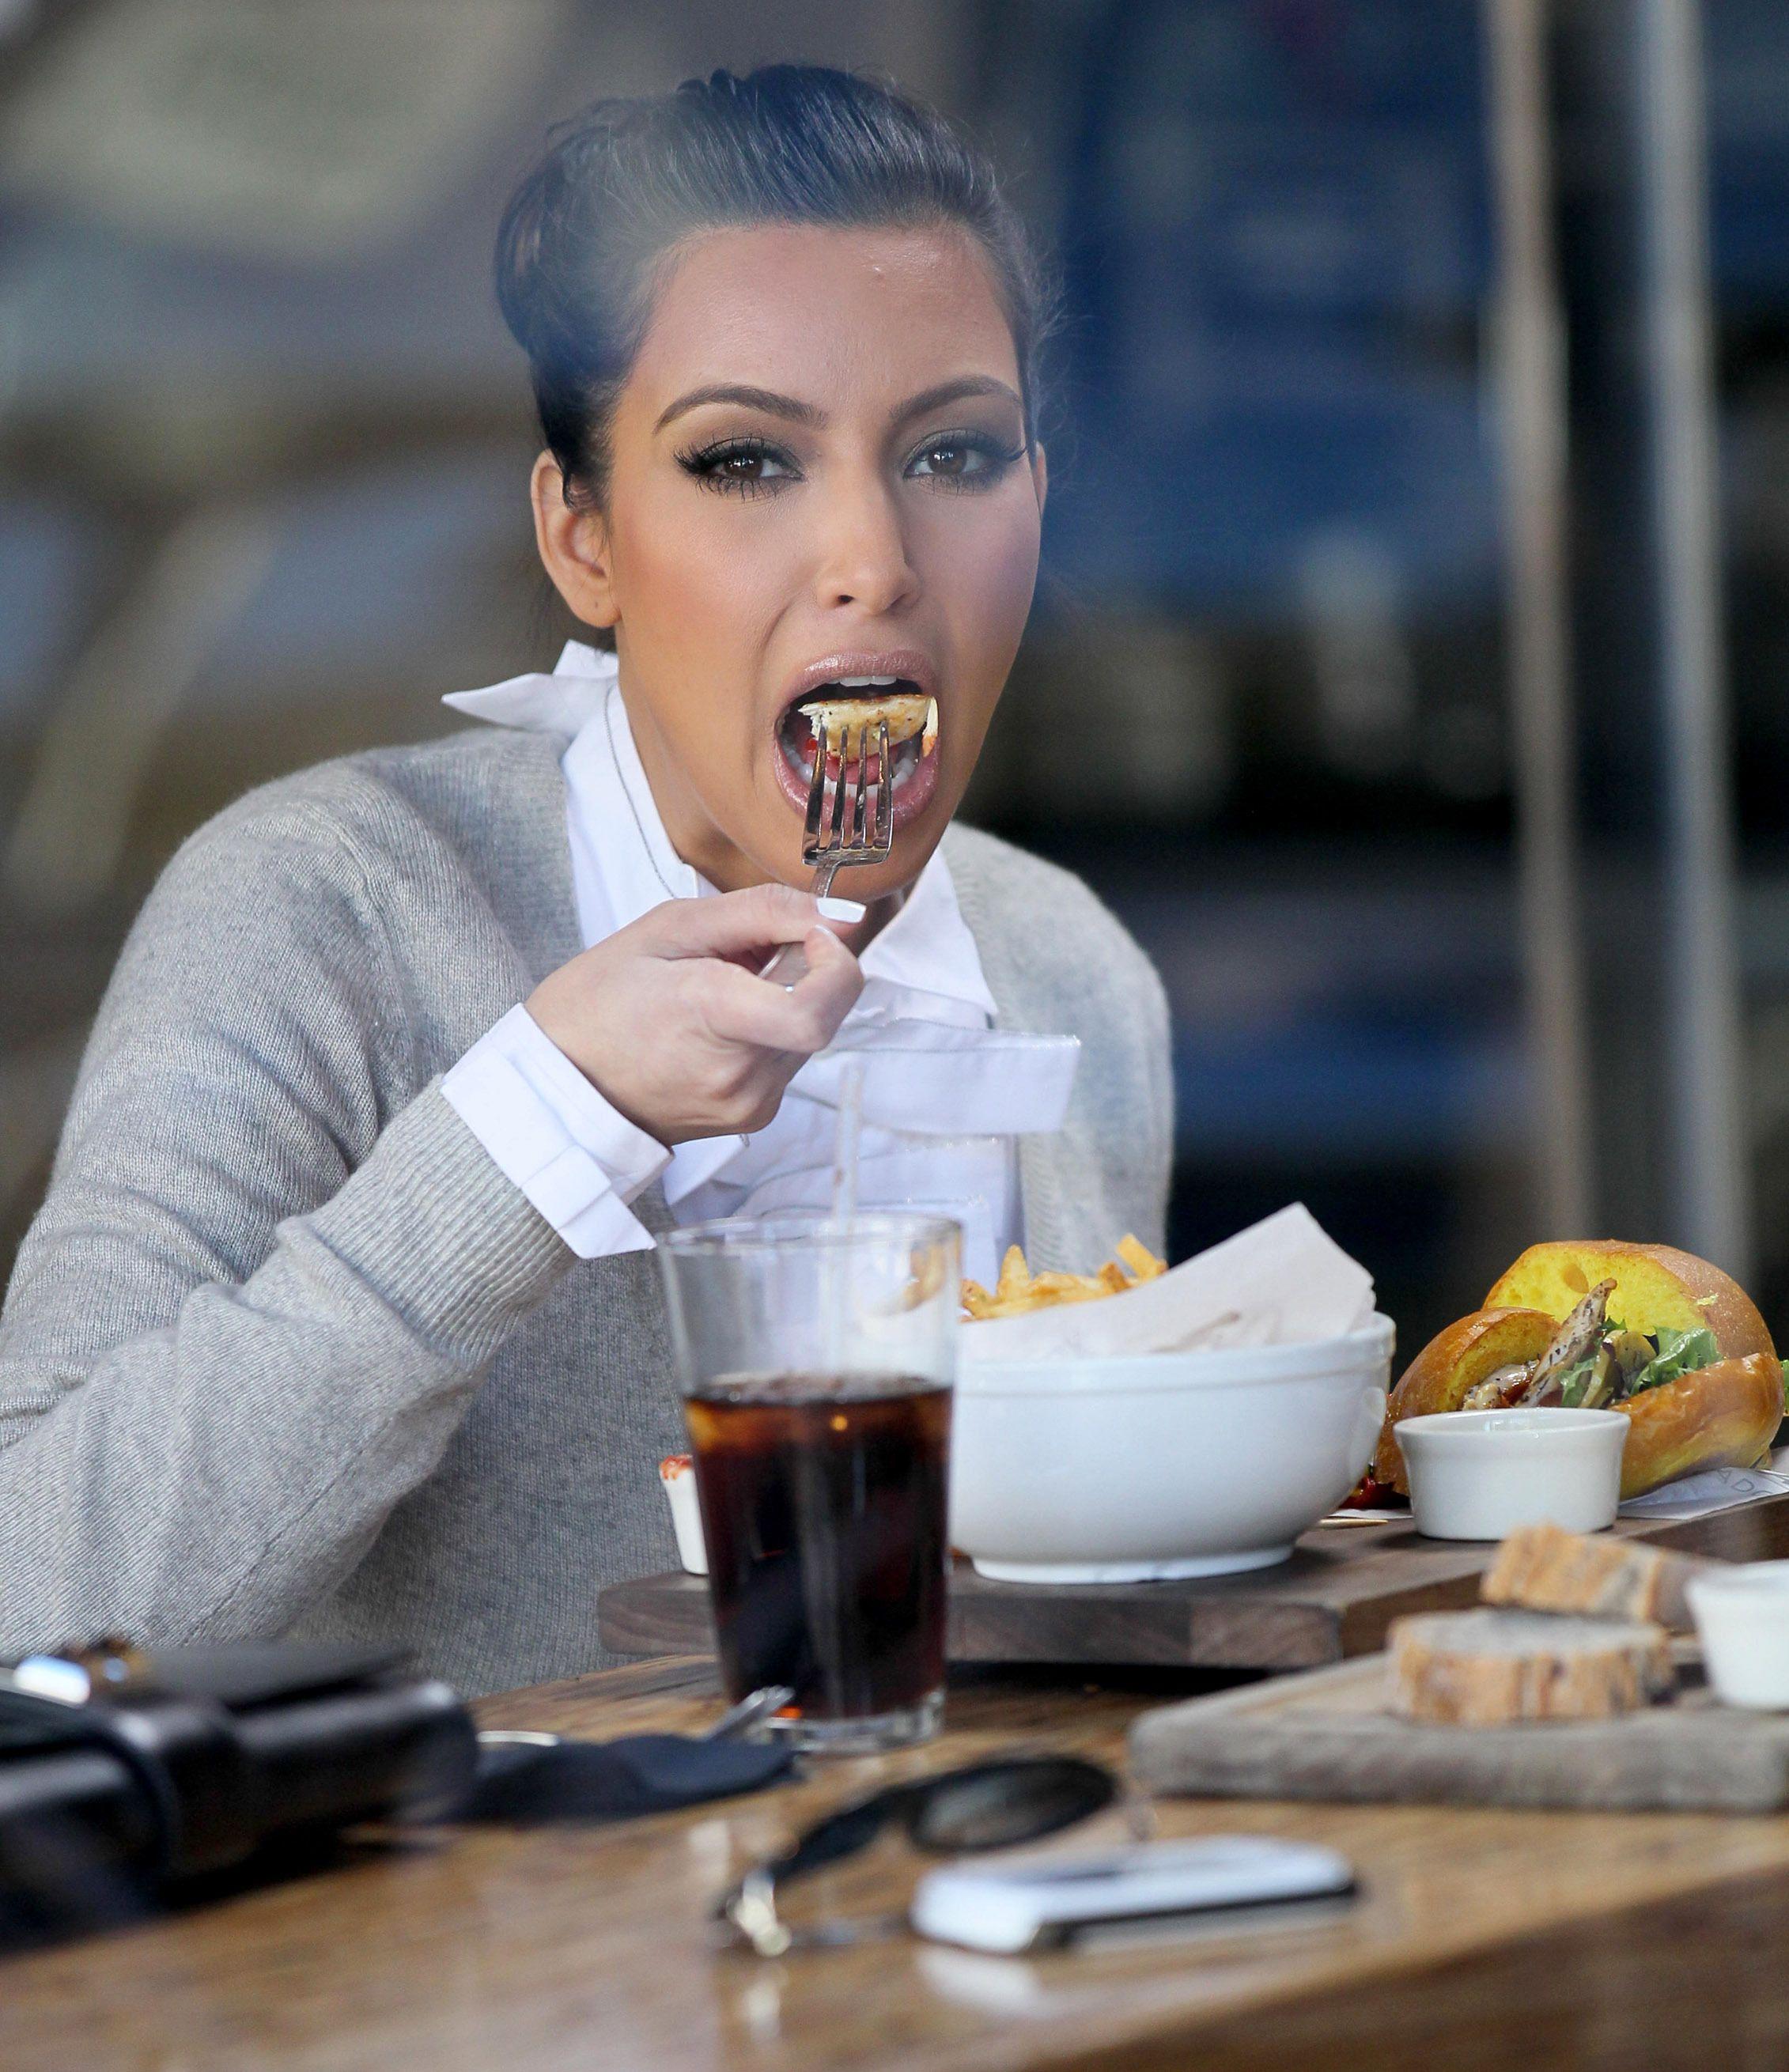 19 celebrities eating junk food pressroomvip